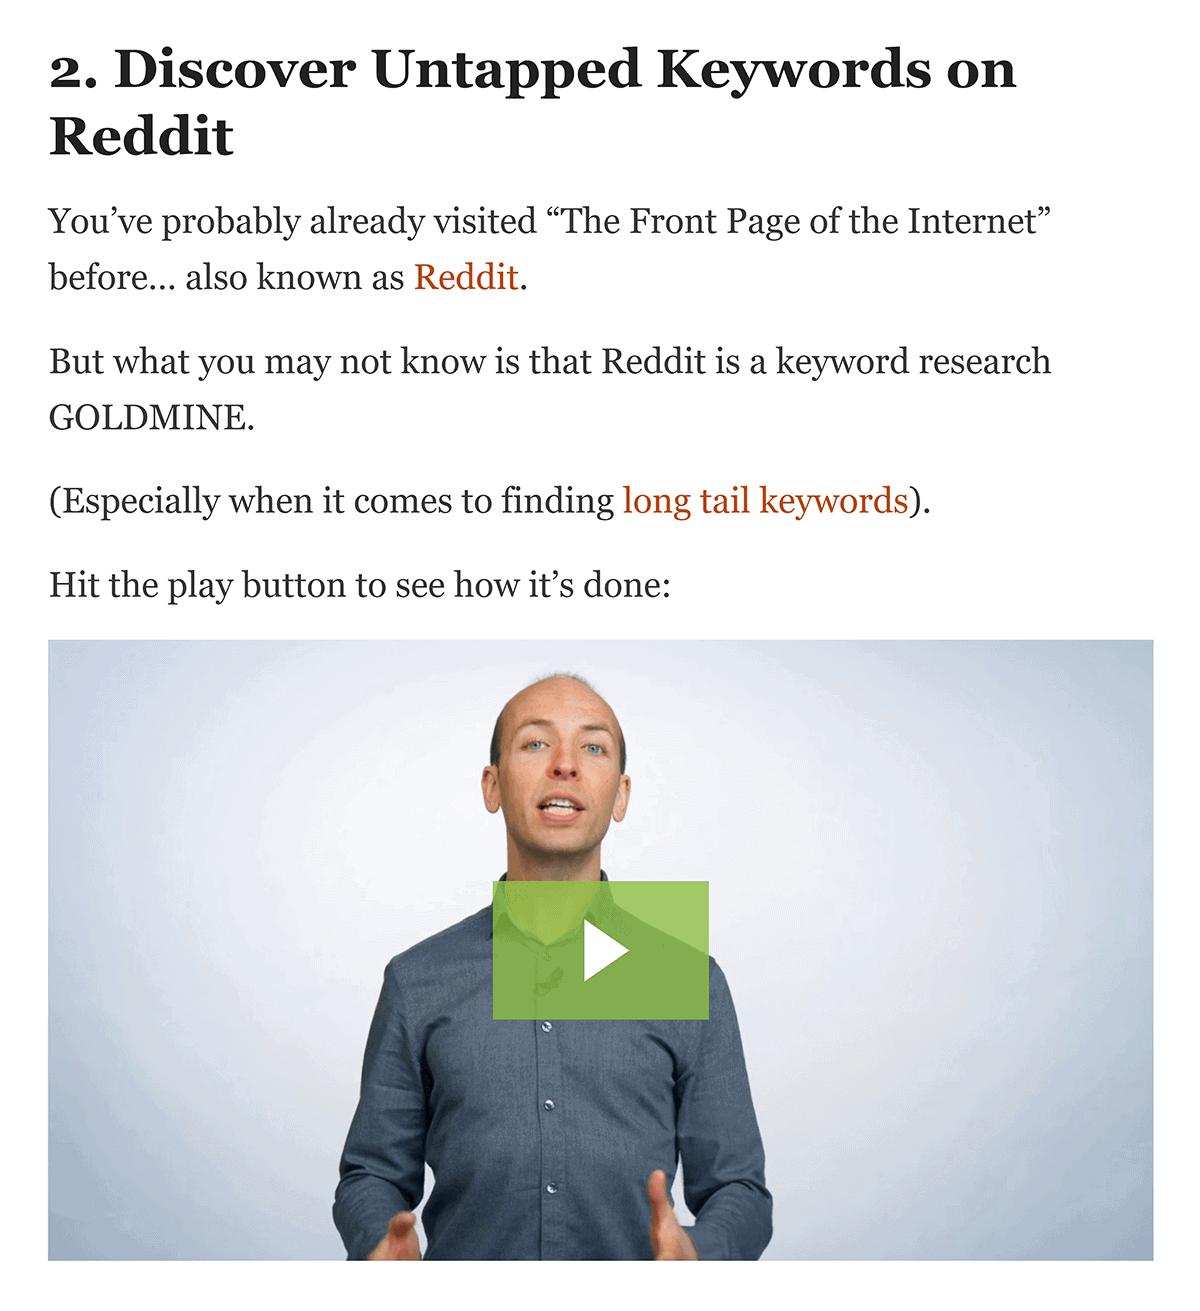 """Discover Untapped Keywords on Reddit"" step to video"